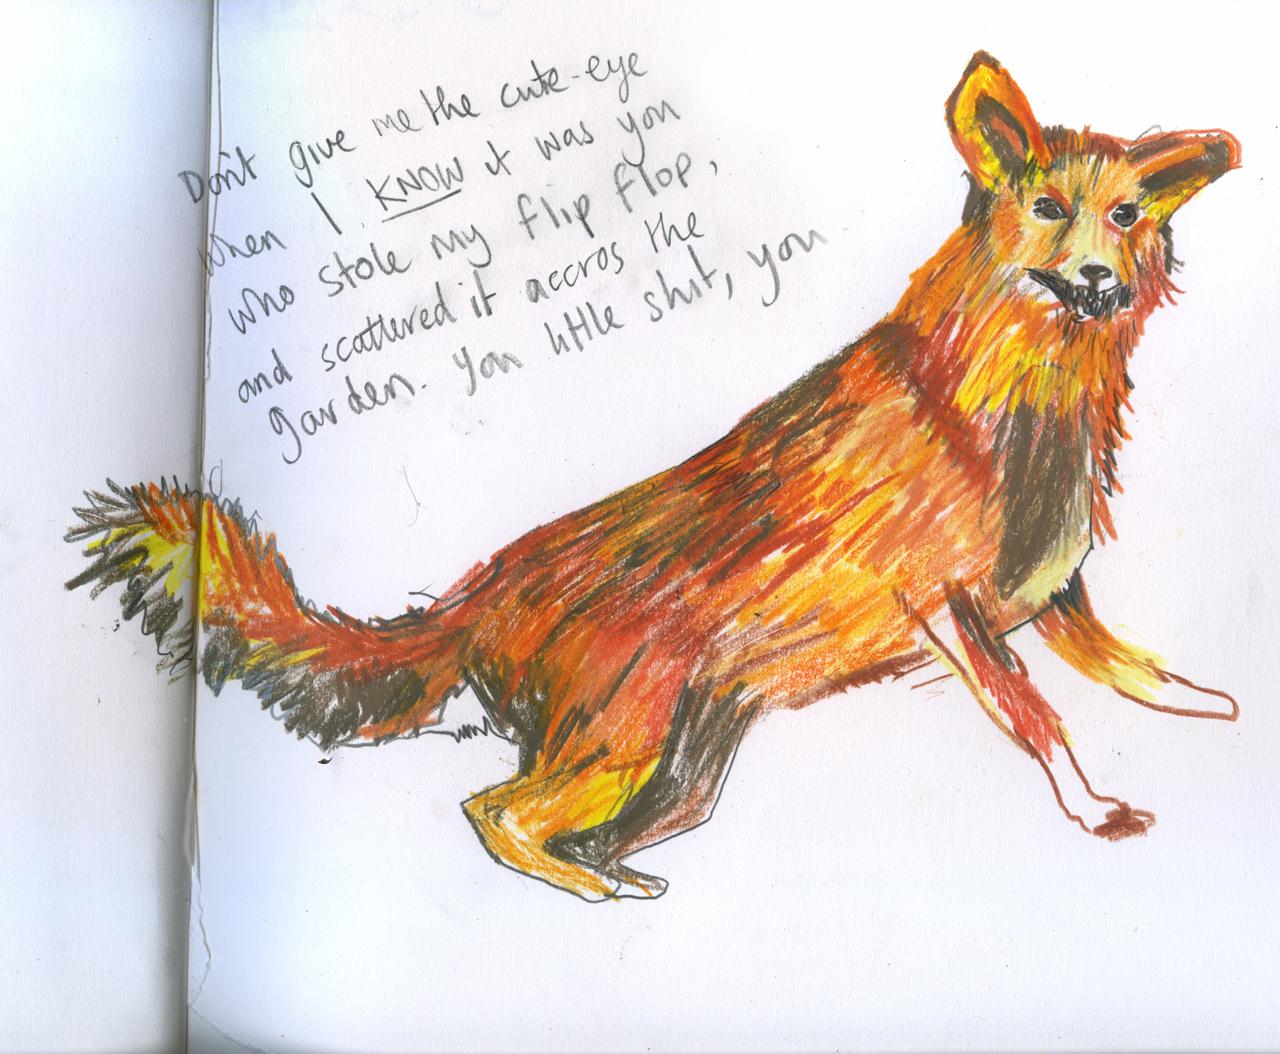 BAD fox. I could kick you. I could.